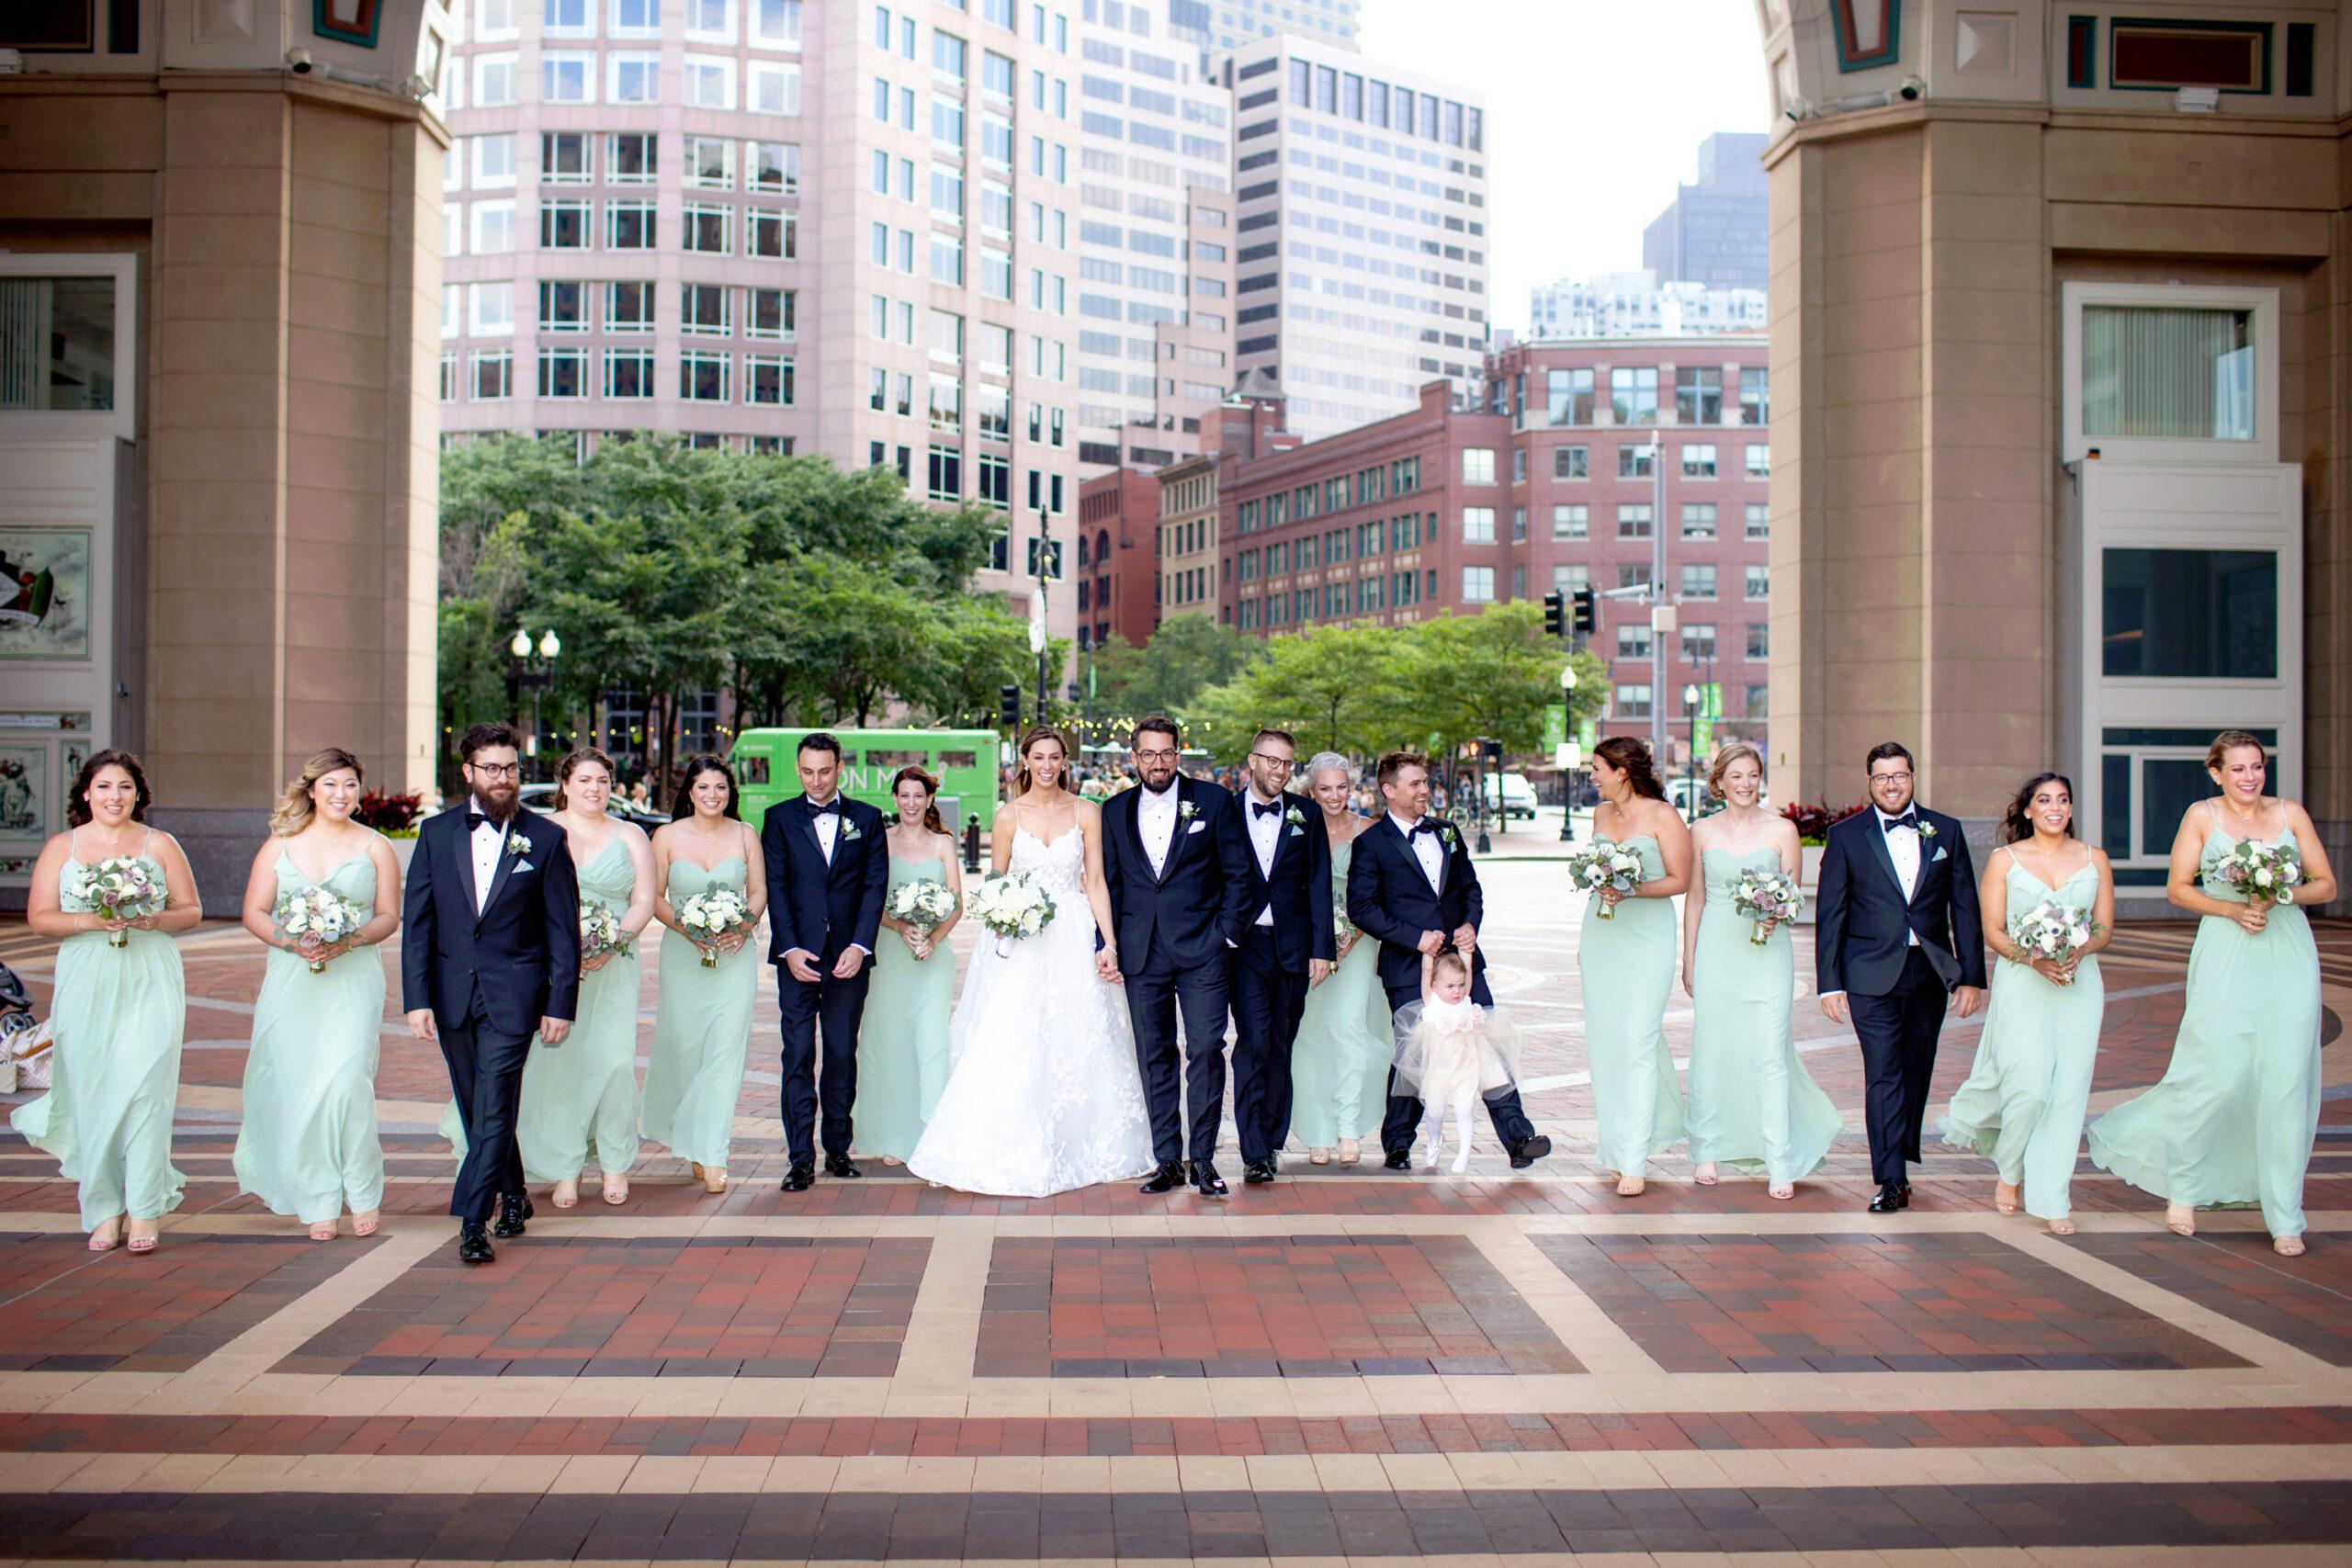 weddings in 2021